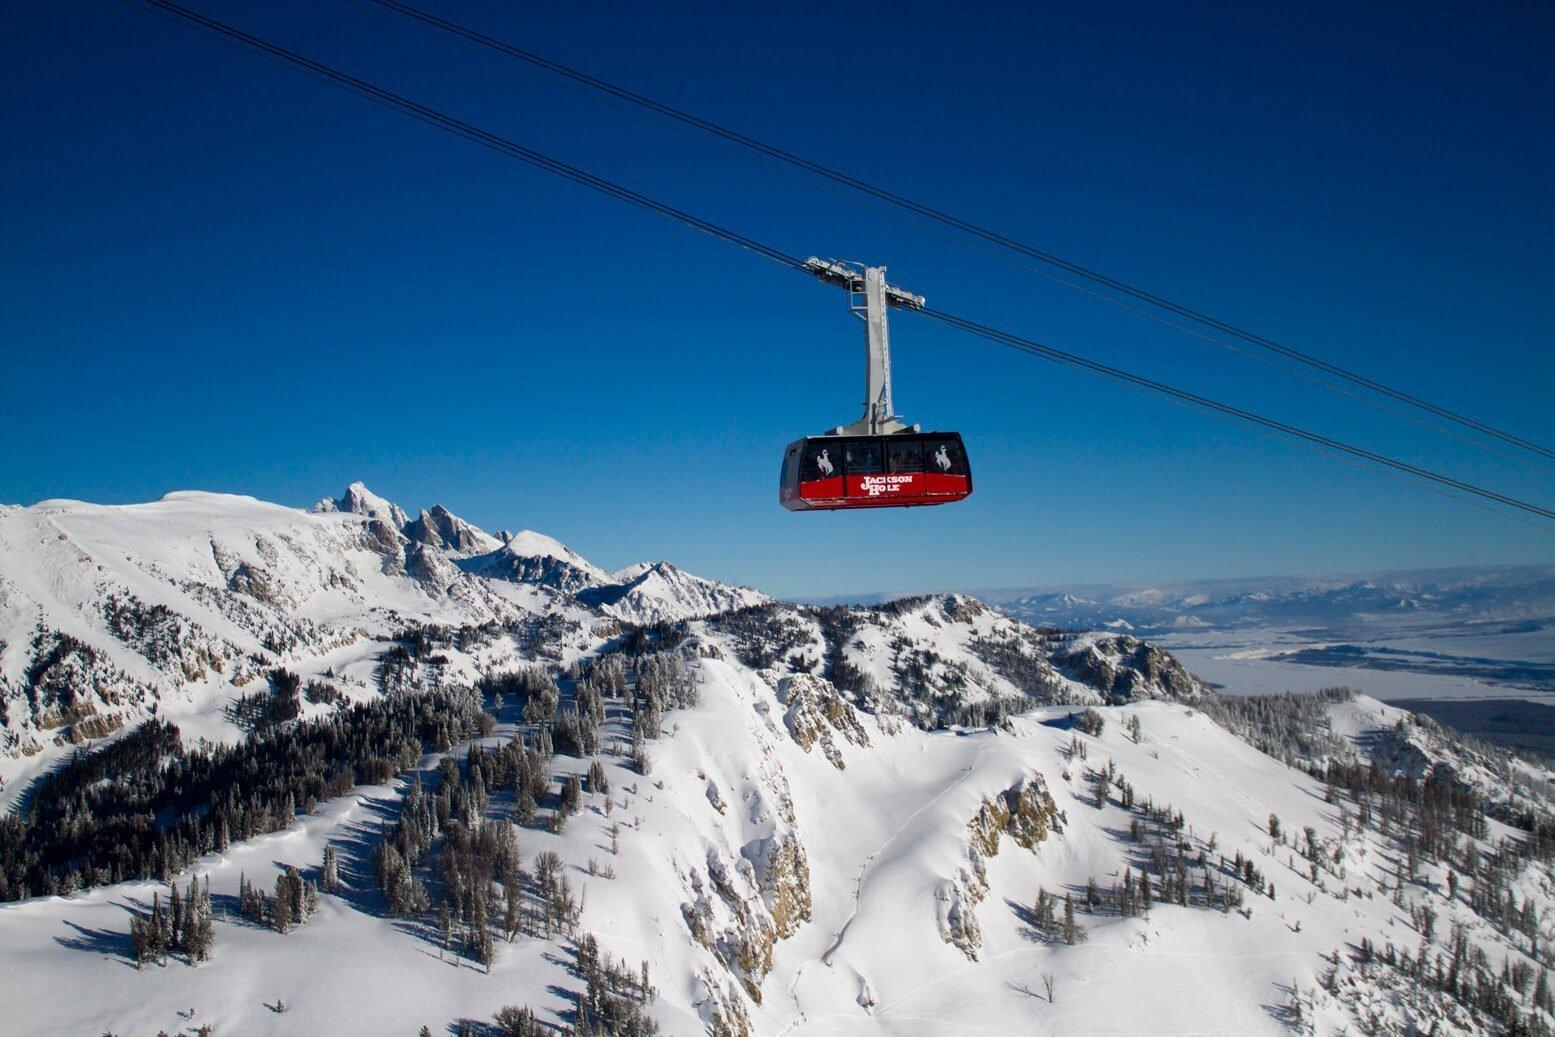 jackson-hole-tram-lift-winter-snow.jpg